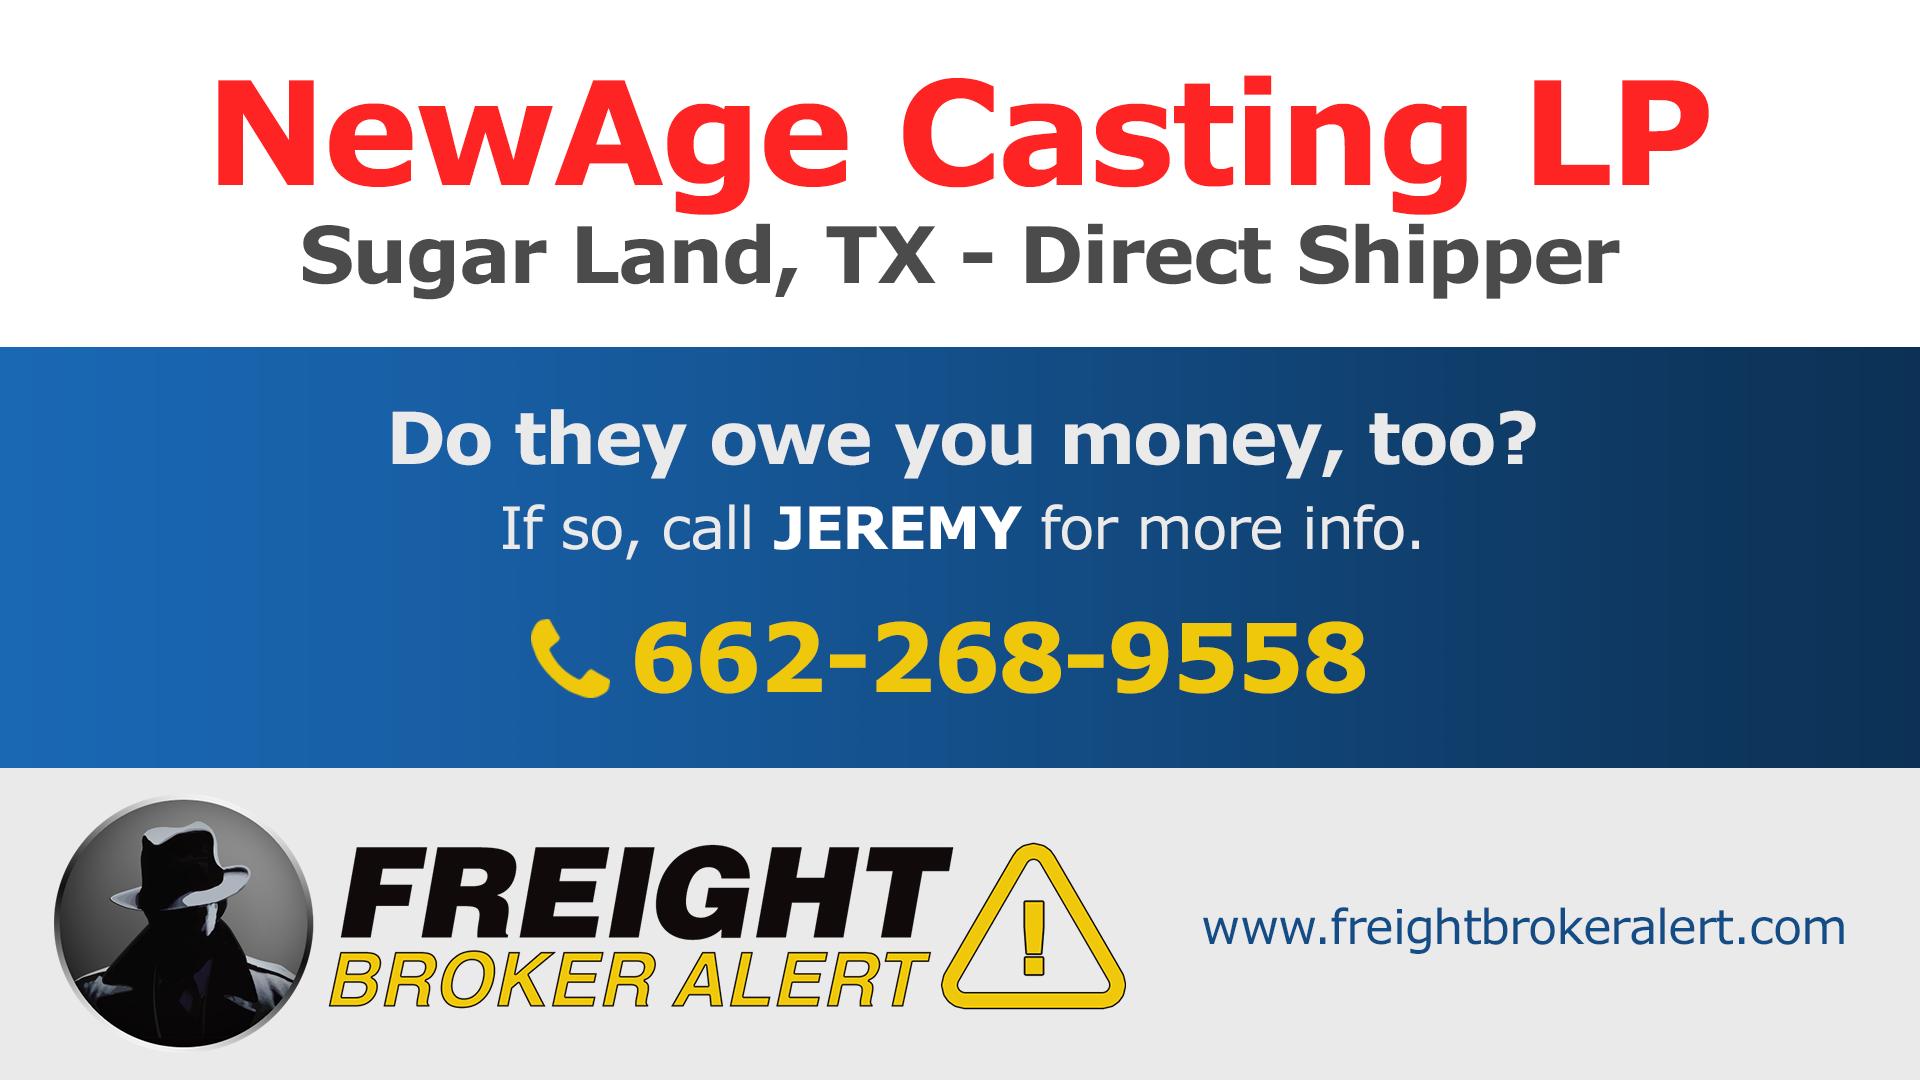 NewAge Casting LP Texas